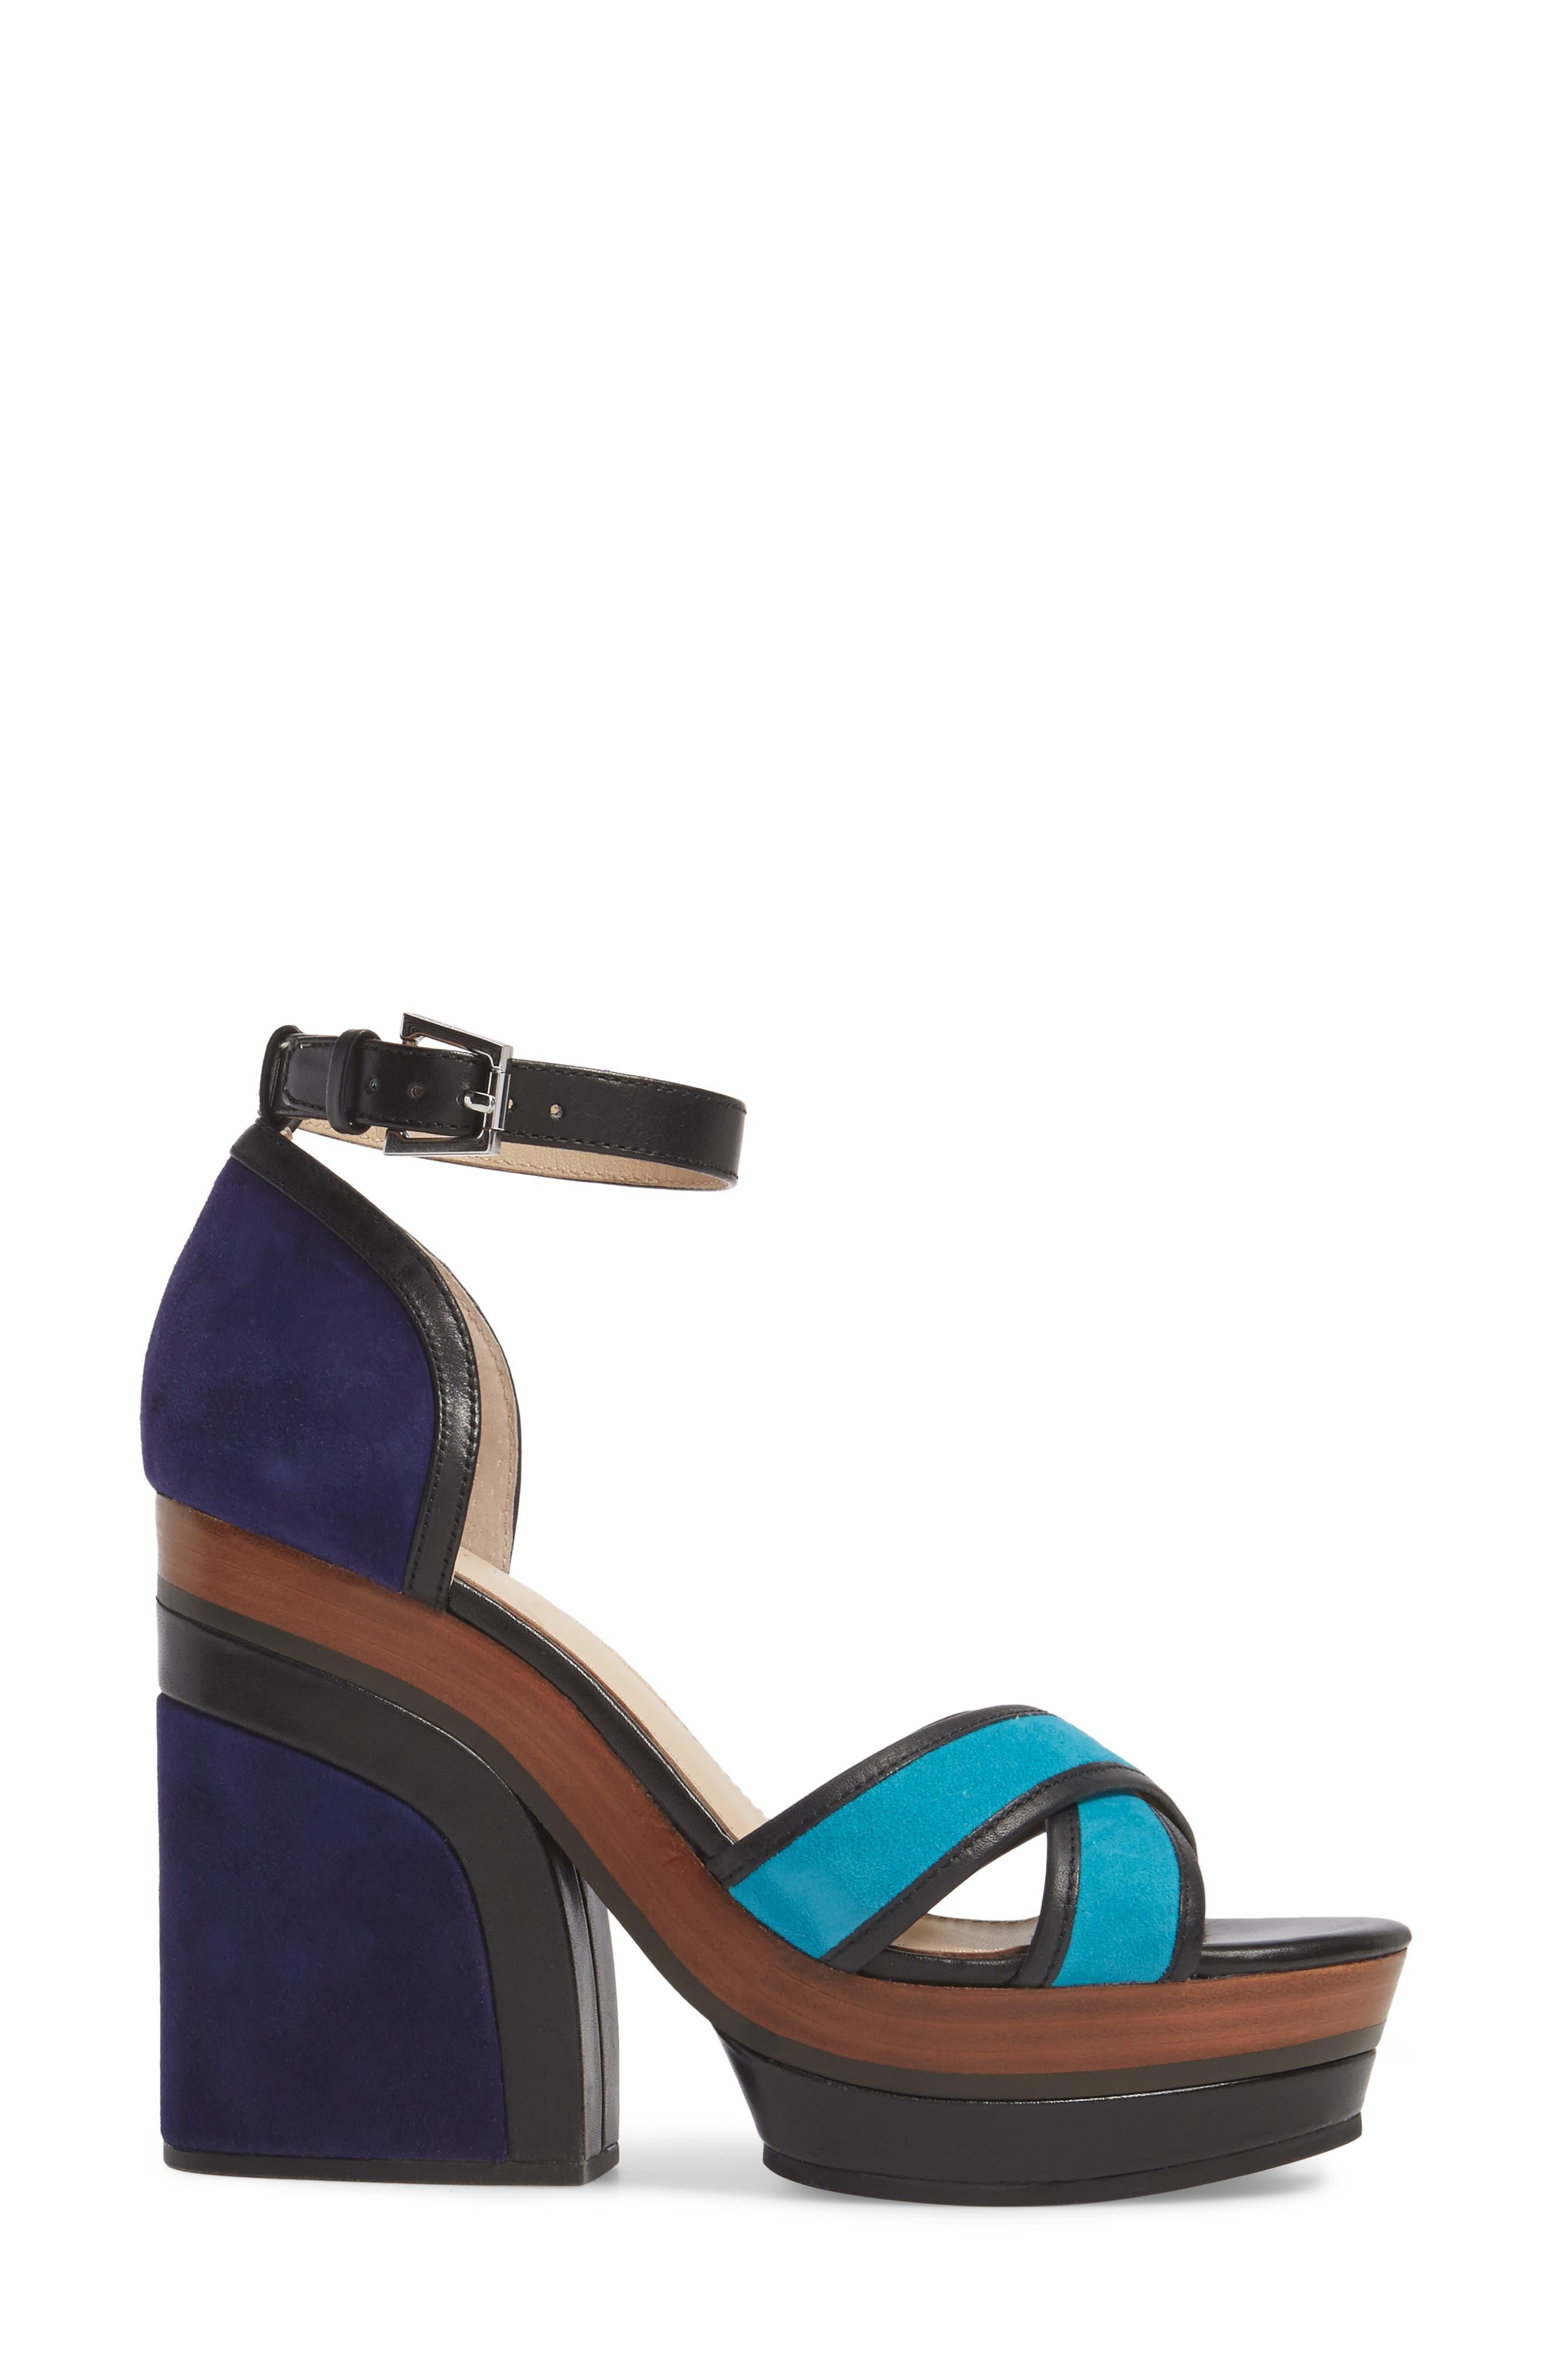 Paloma Ankle Strap Sandal,                             Alternate thumbnail 3, color,                             Ultra Marine Suede